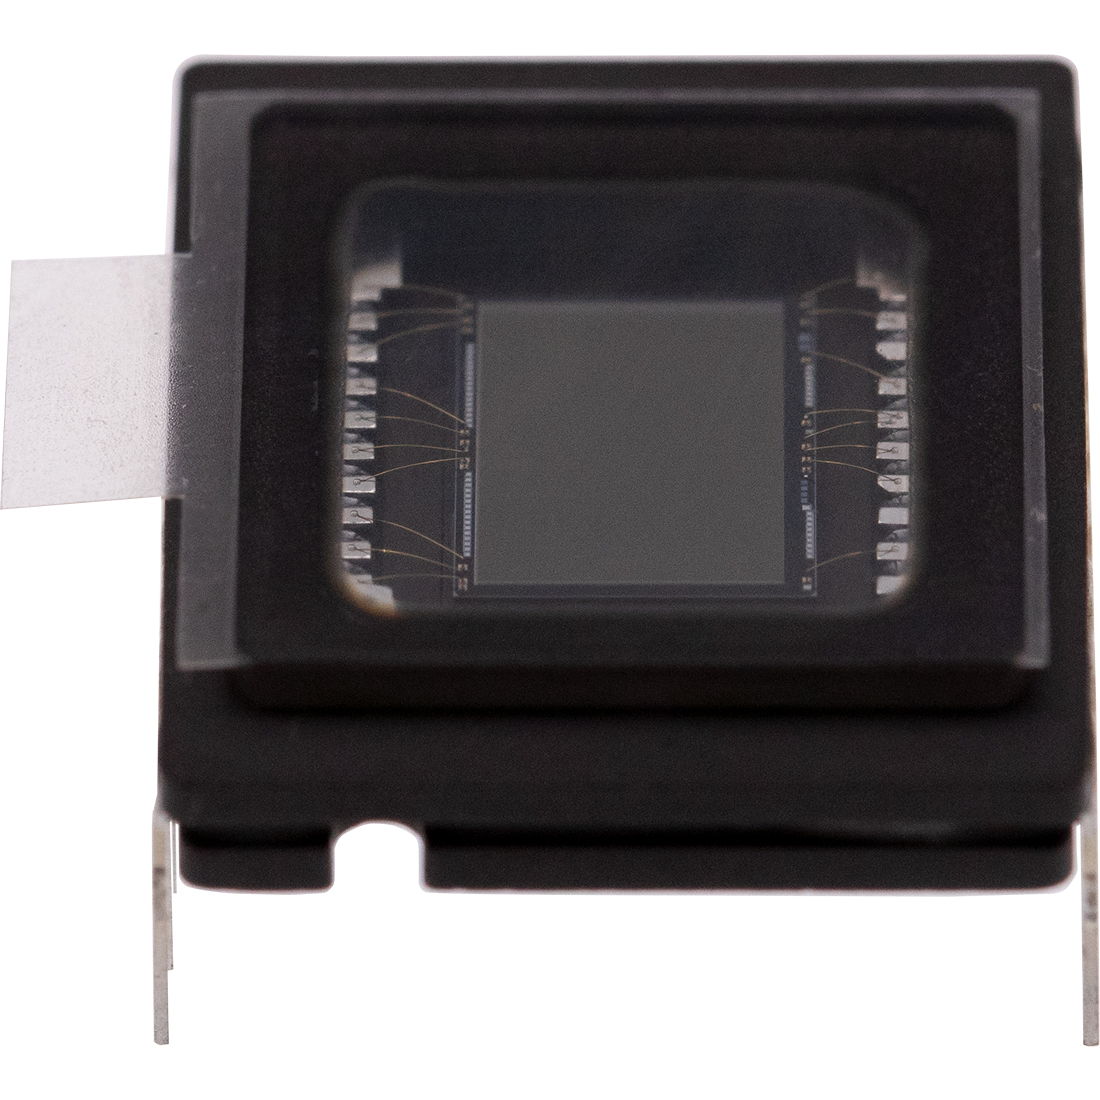 ICX429ALL,索尼1/2 CCD黑白图像传感器,工业相机黑白图像传感器,1/2 CCD B/W SENSOR, SECURITY CAMERA B/W CCD SENSOR, Industrial camera 1/2 CCD SENSOR,监控安防黑白摄像机1/2 CCD